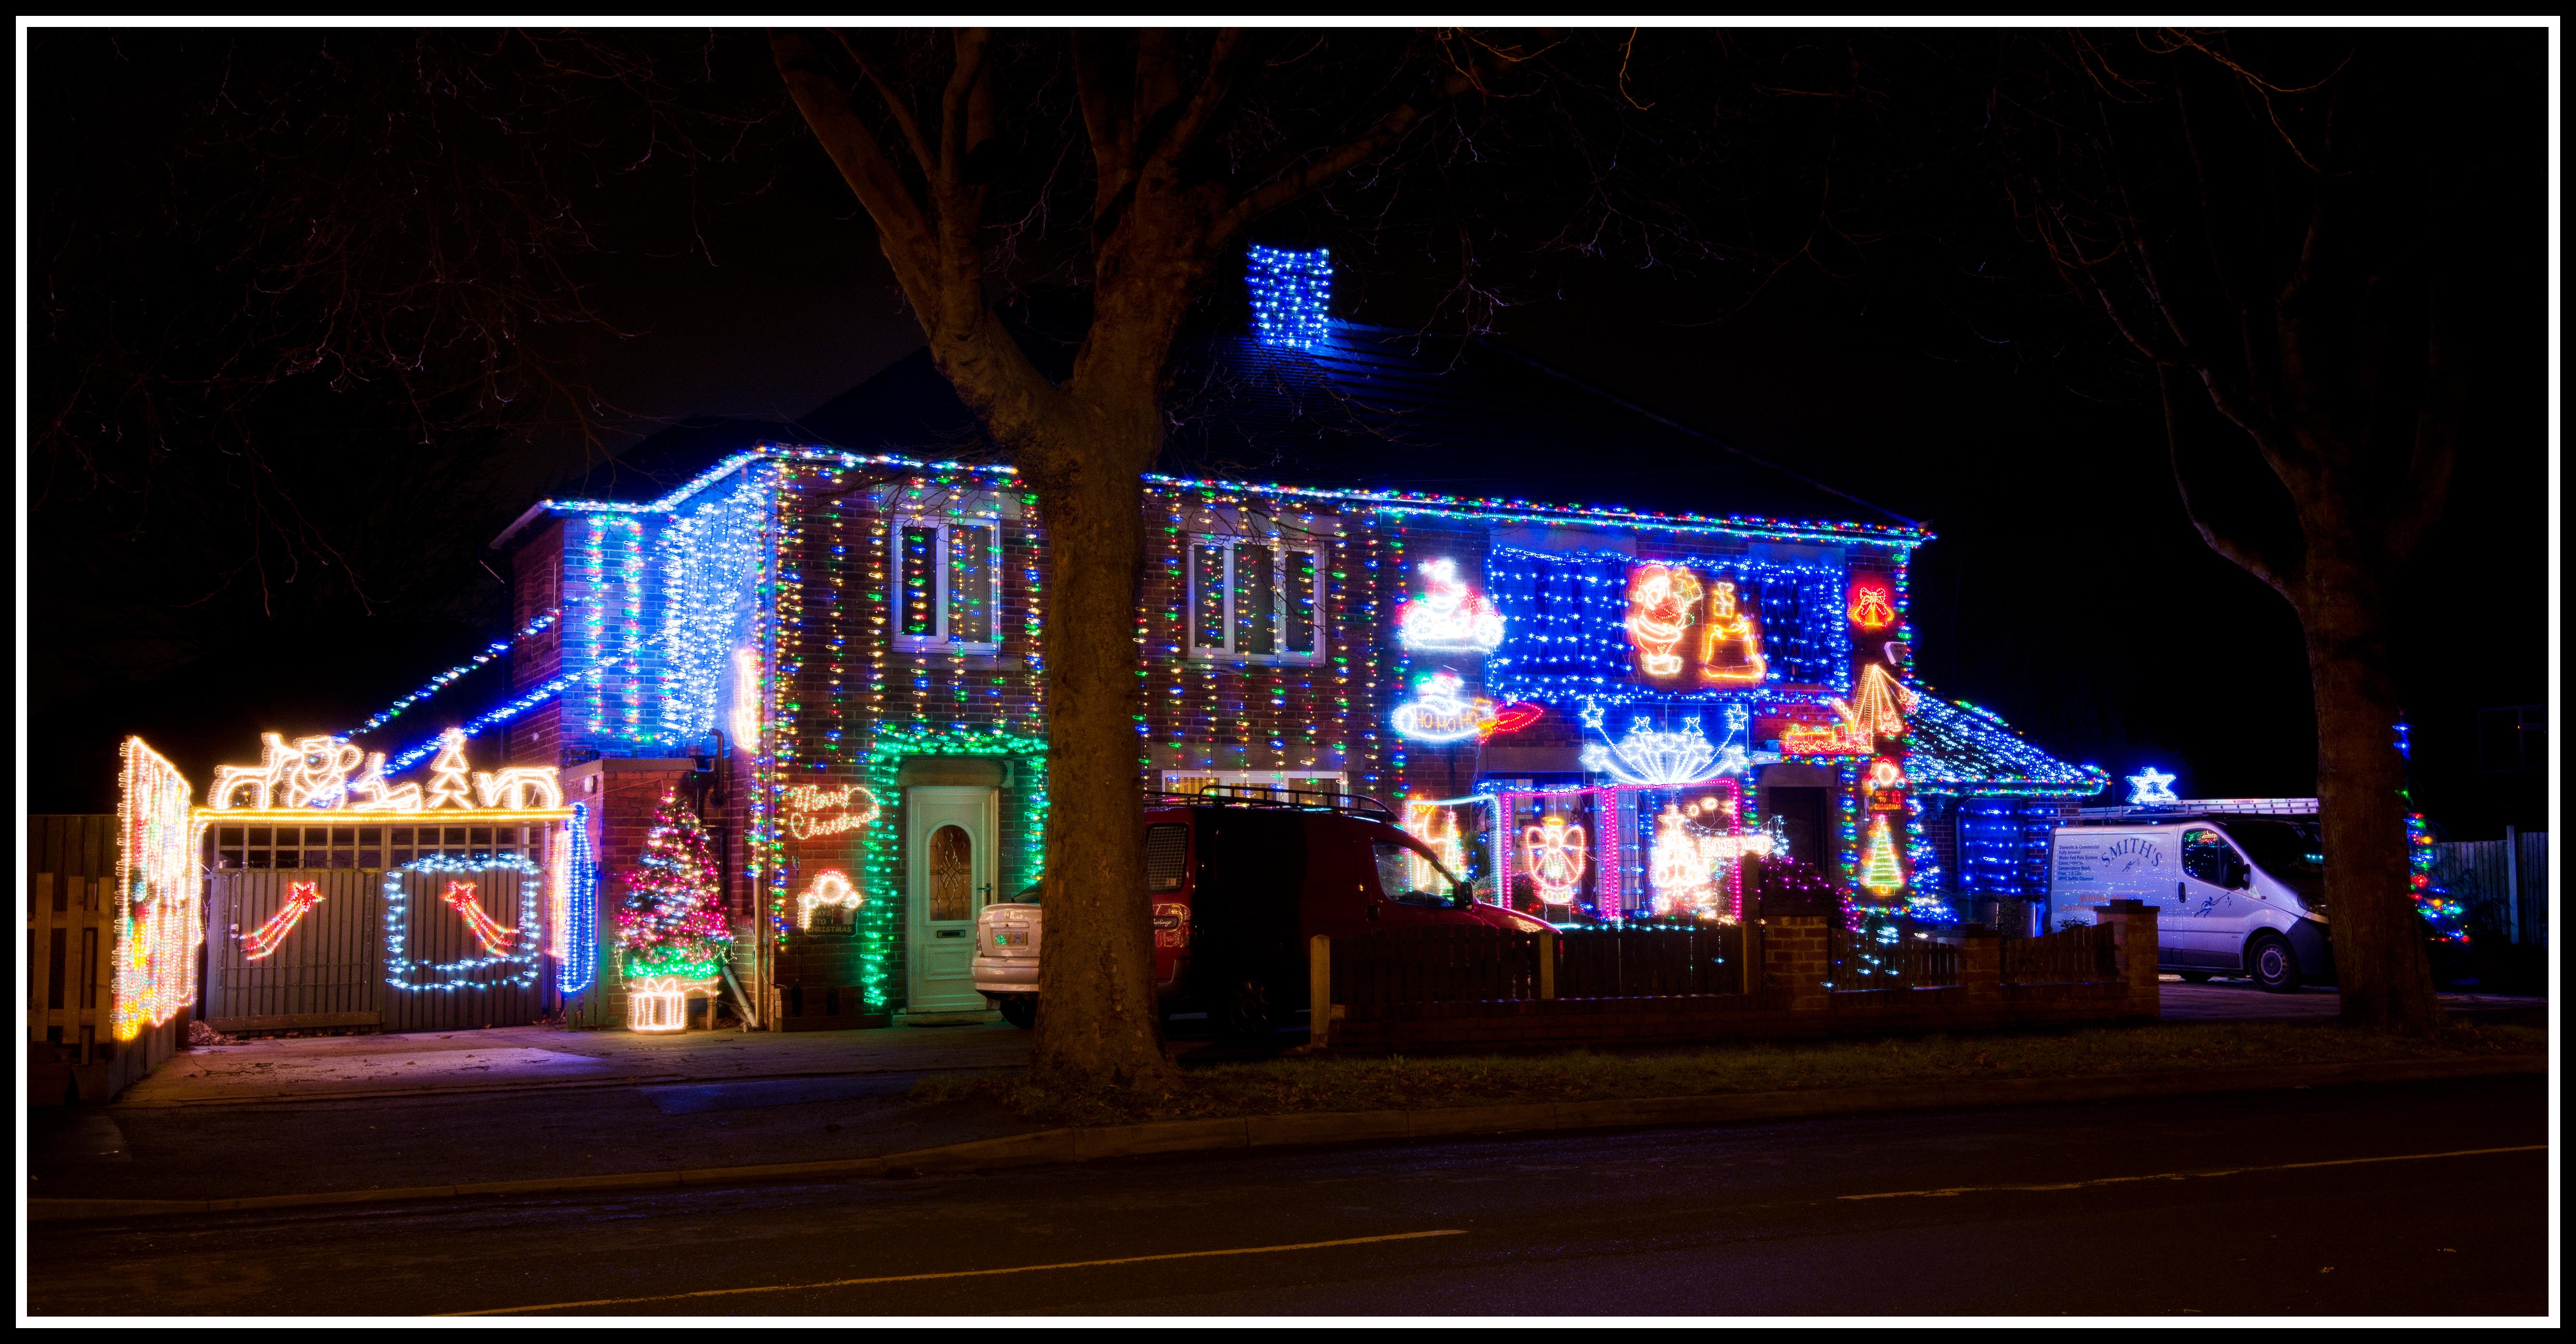 Colorful Christmas Lights On House.Free Images Light Night House Home Religion Nikon